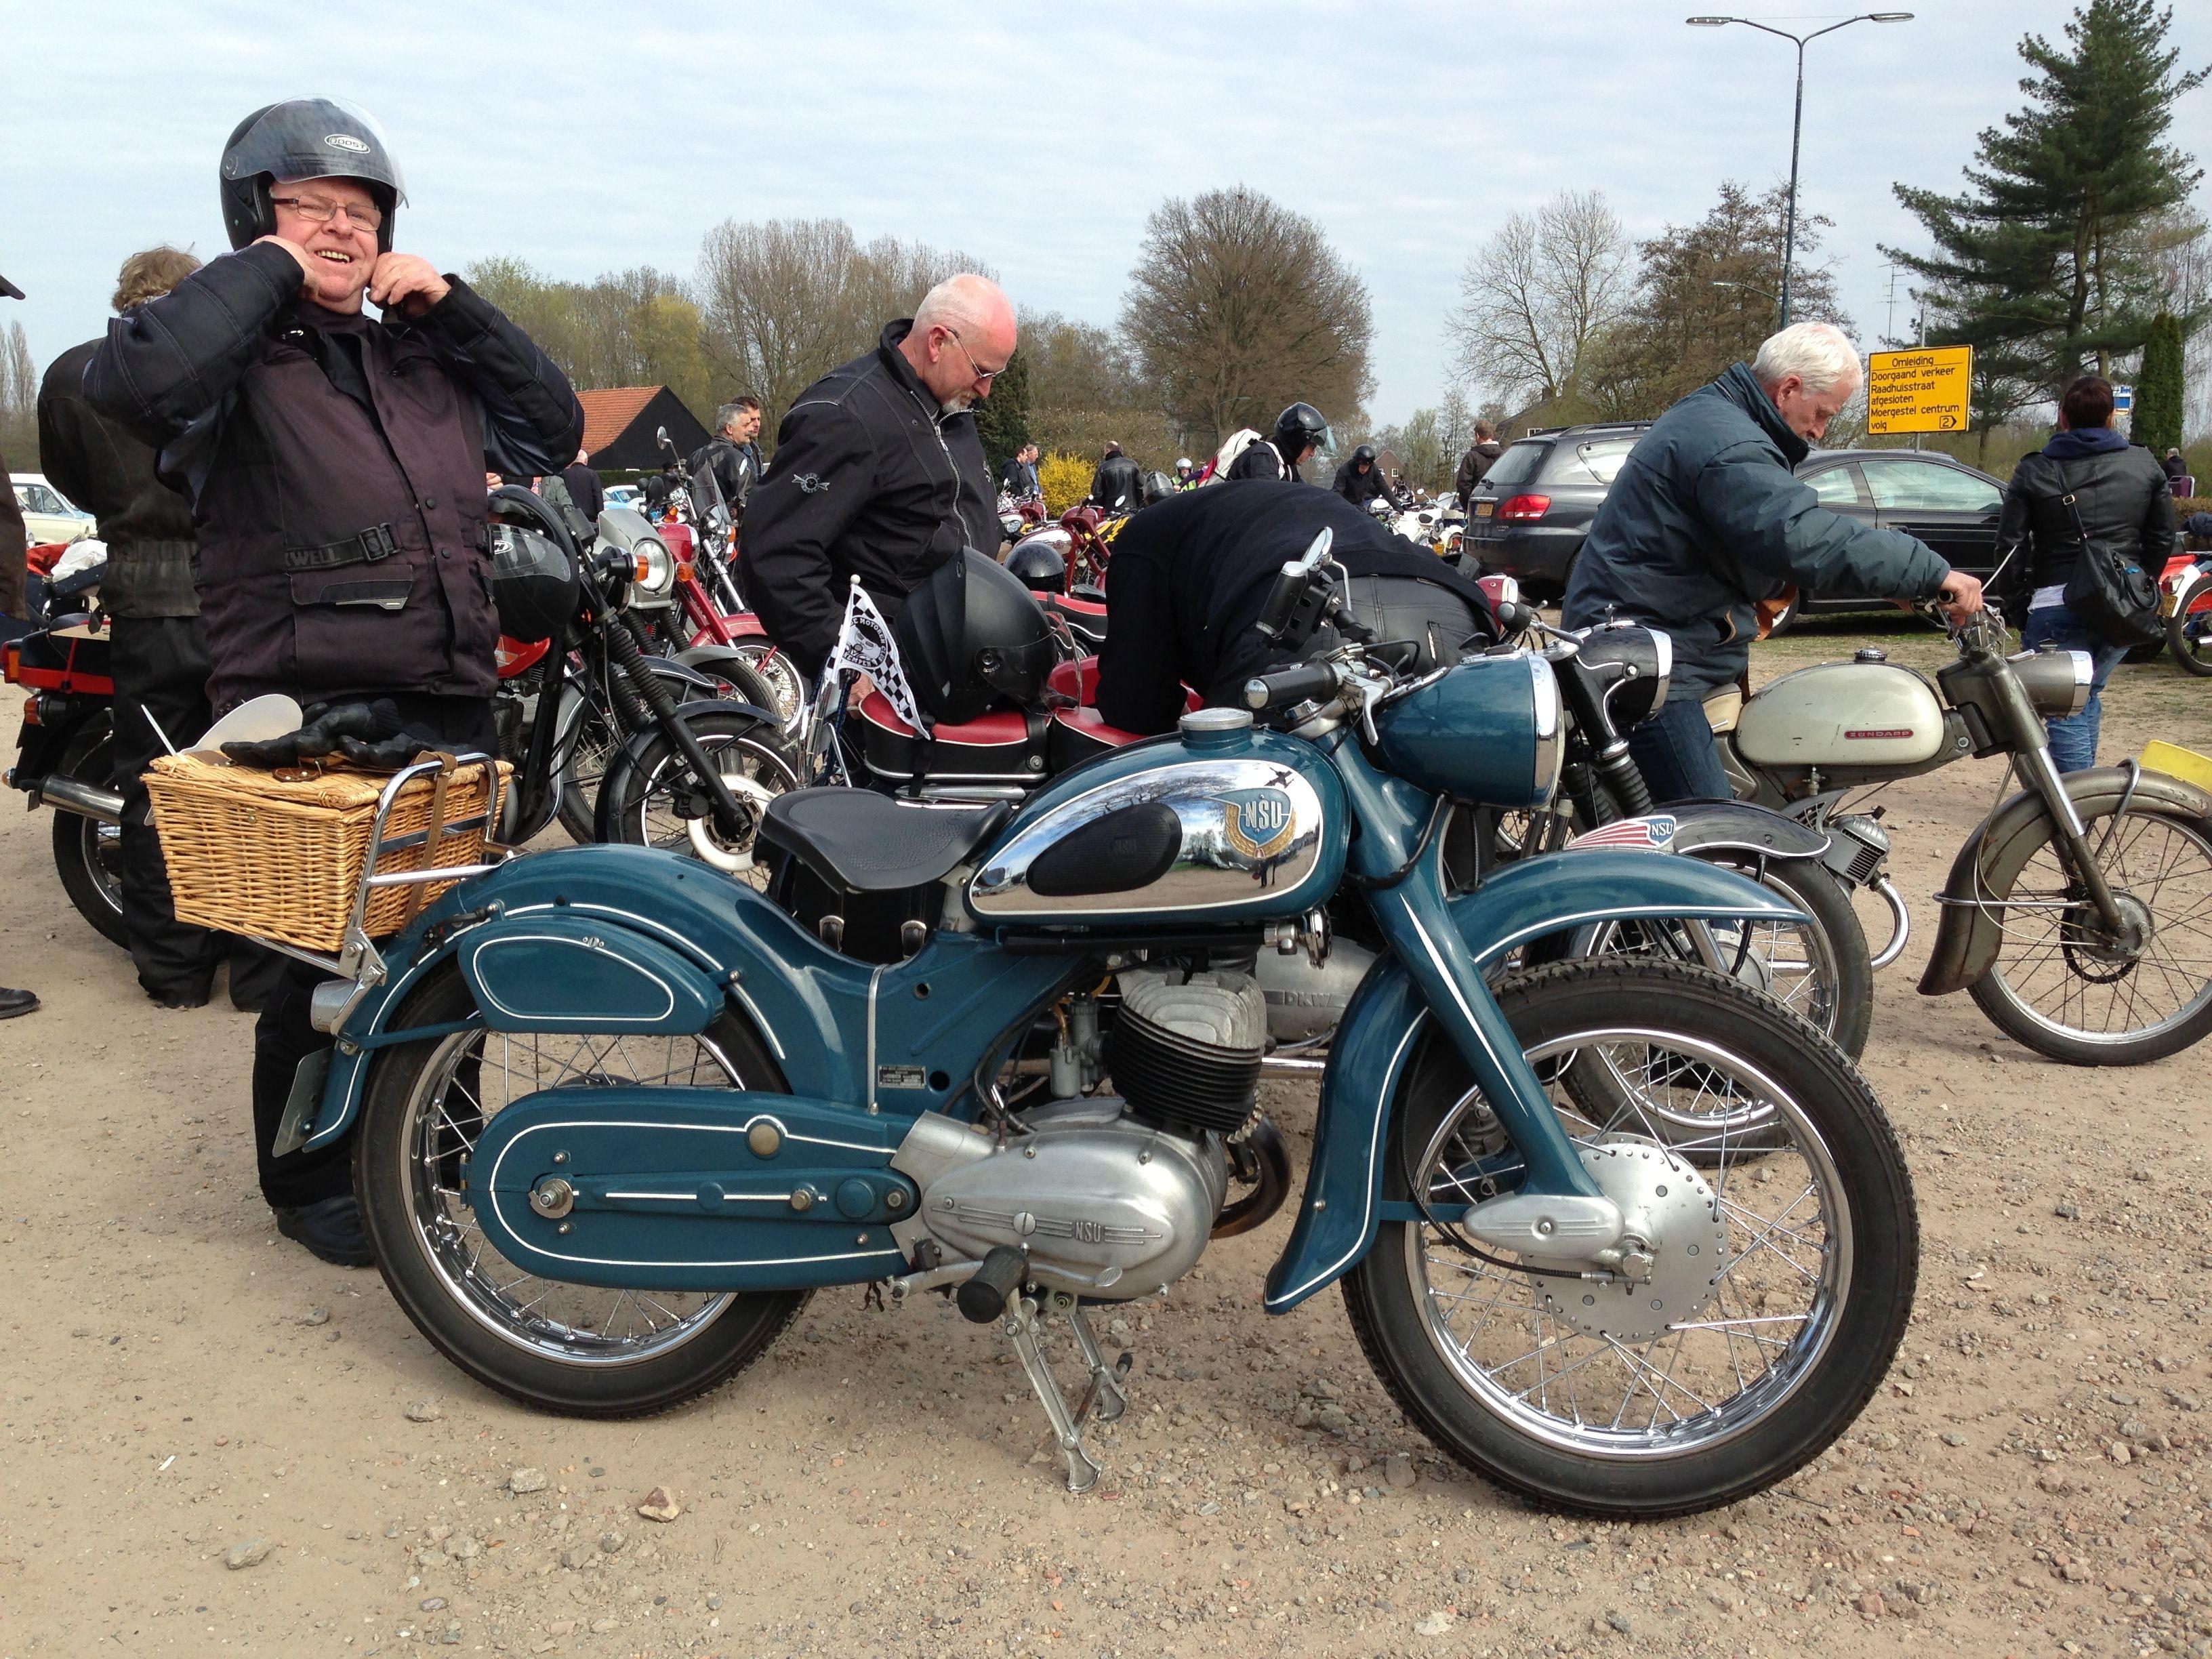 Nsu Motorcycle Classic Motorcycles Vintage Motorcycles Vintage Bikes